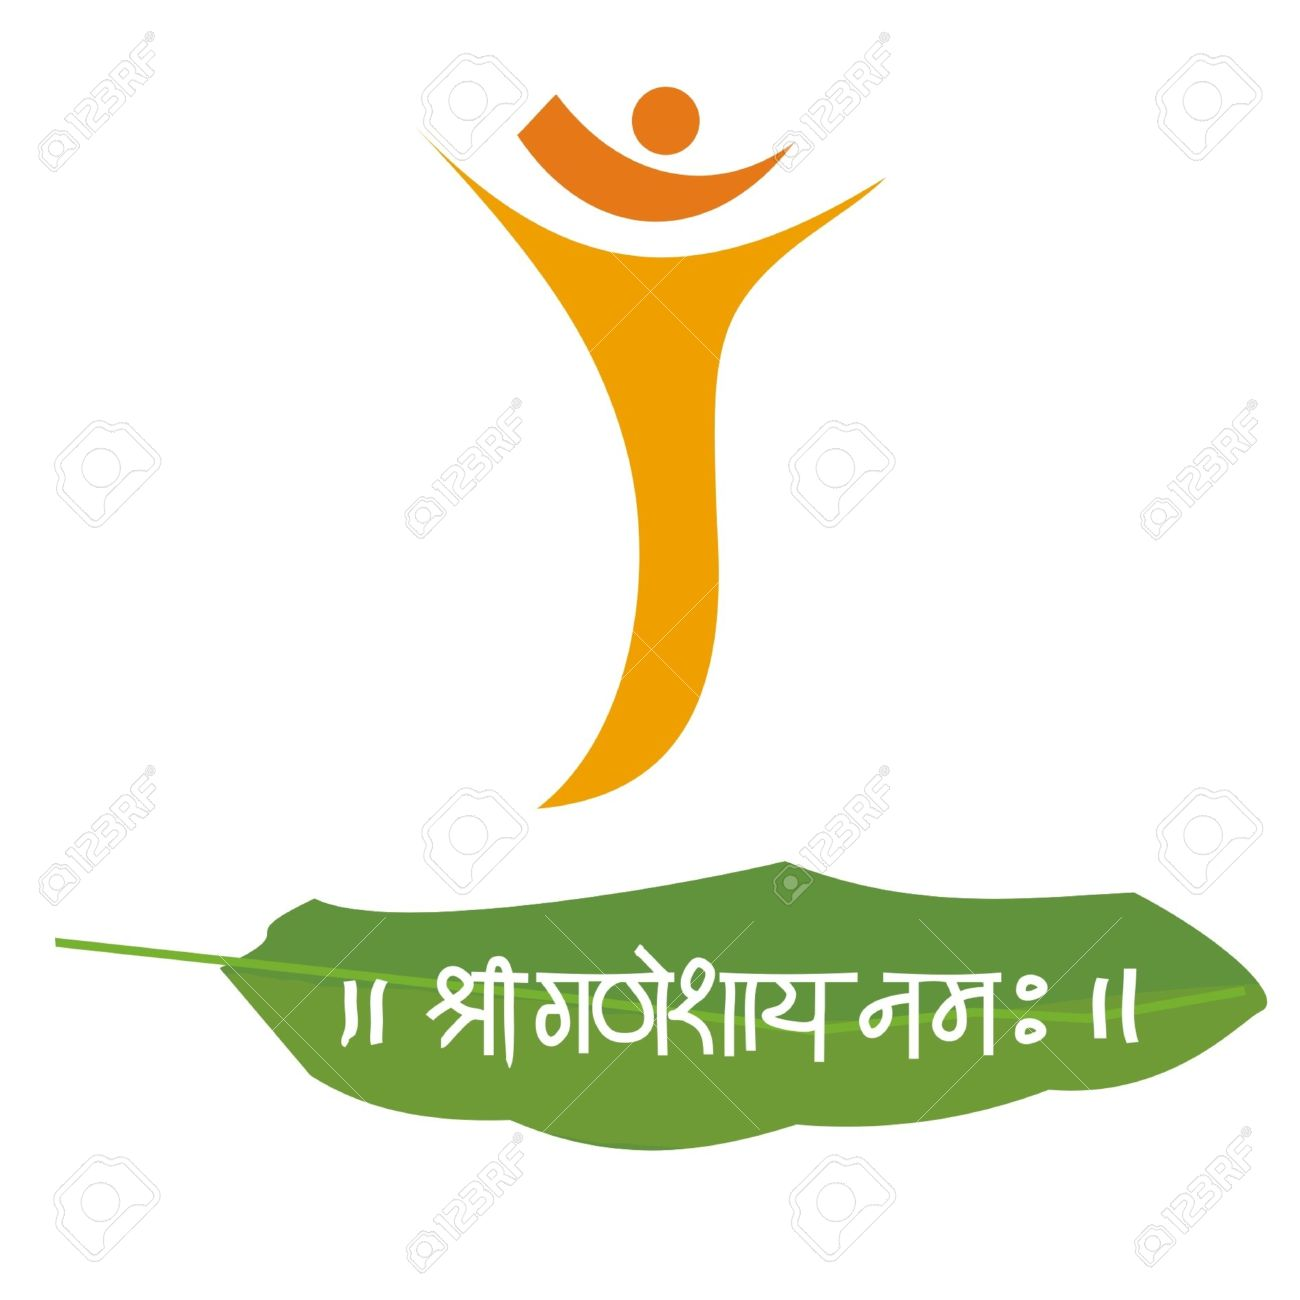 Shree Ganeshay Namah Photo Shree Ganeshay Namah Written